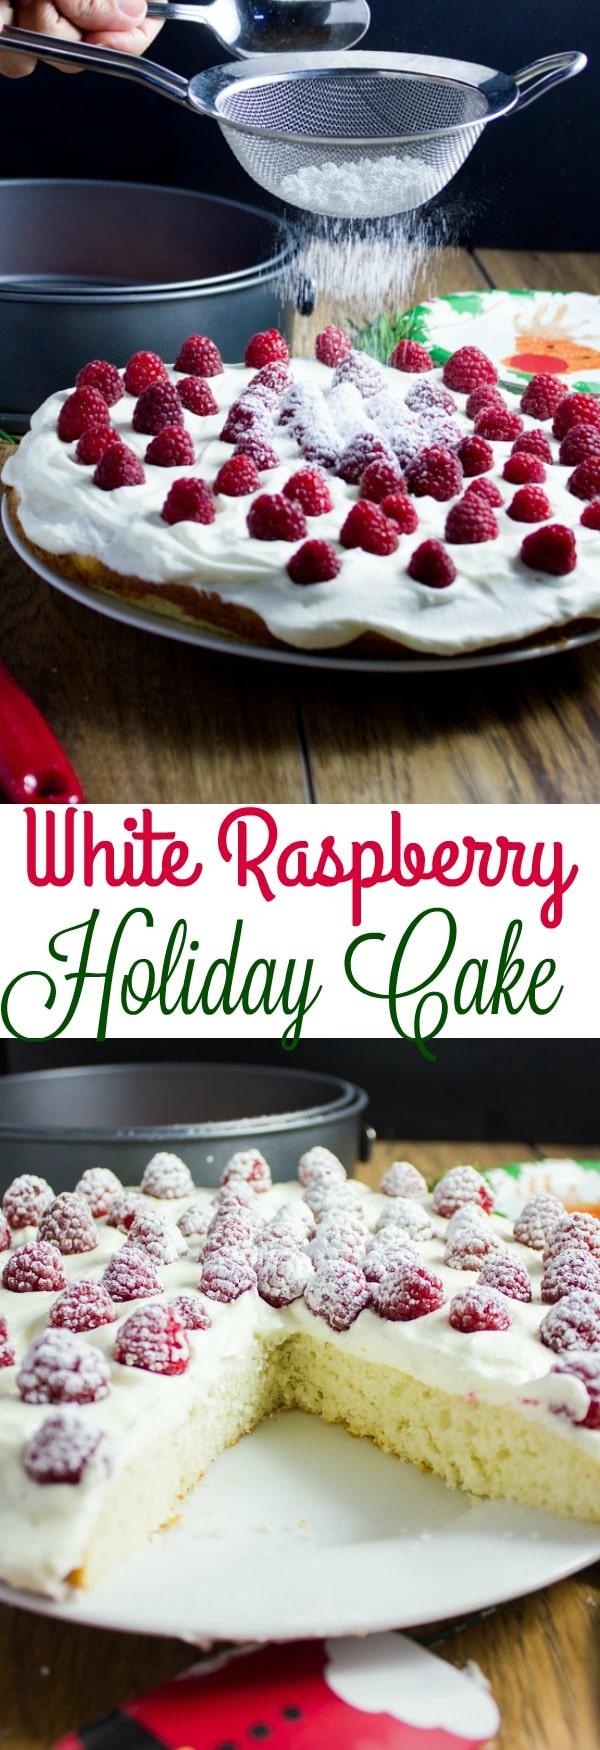 Fluffy White Raspberry Holiday Cake